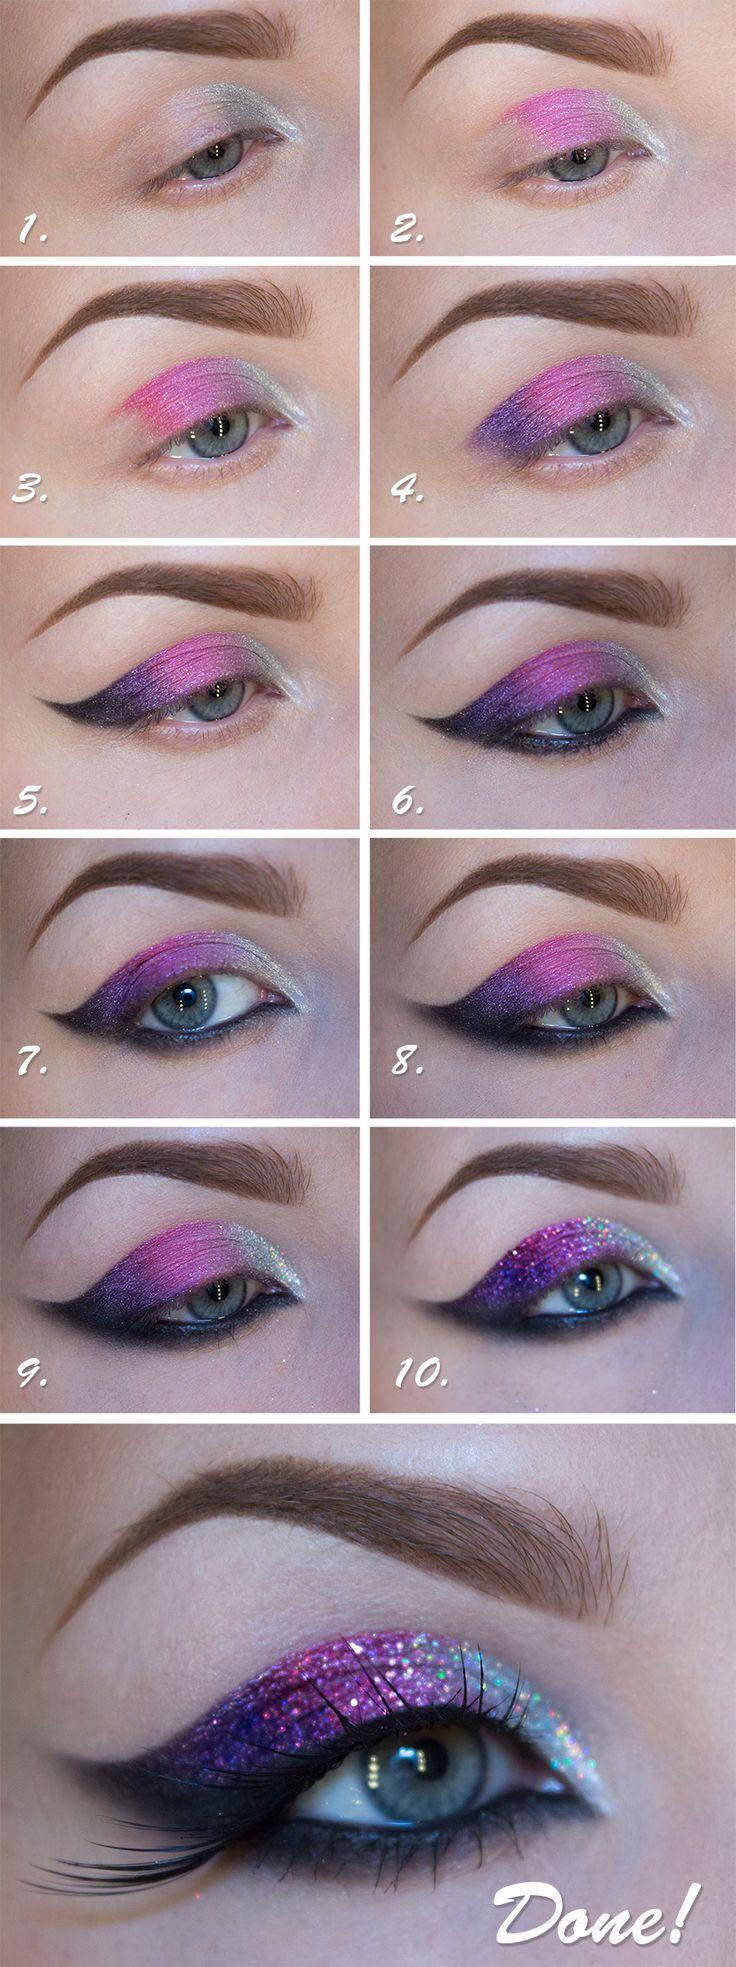 Amazing Collection of Purple Eye Makeup Tutorial - Be Modish - Be Modish